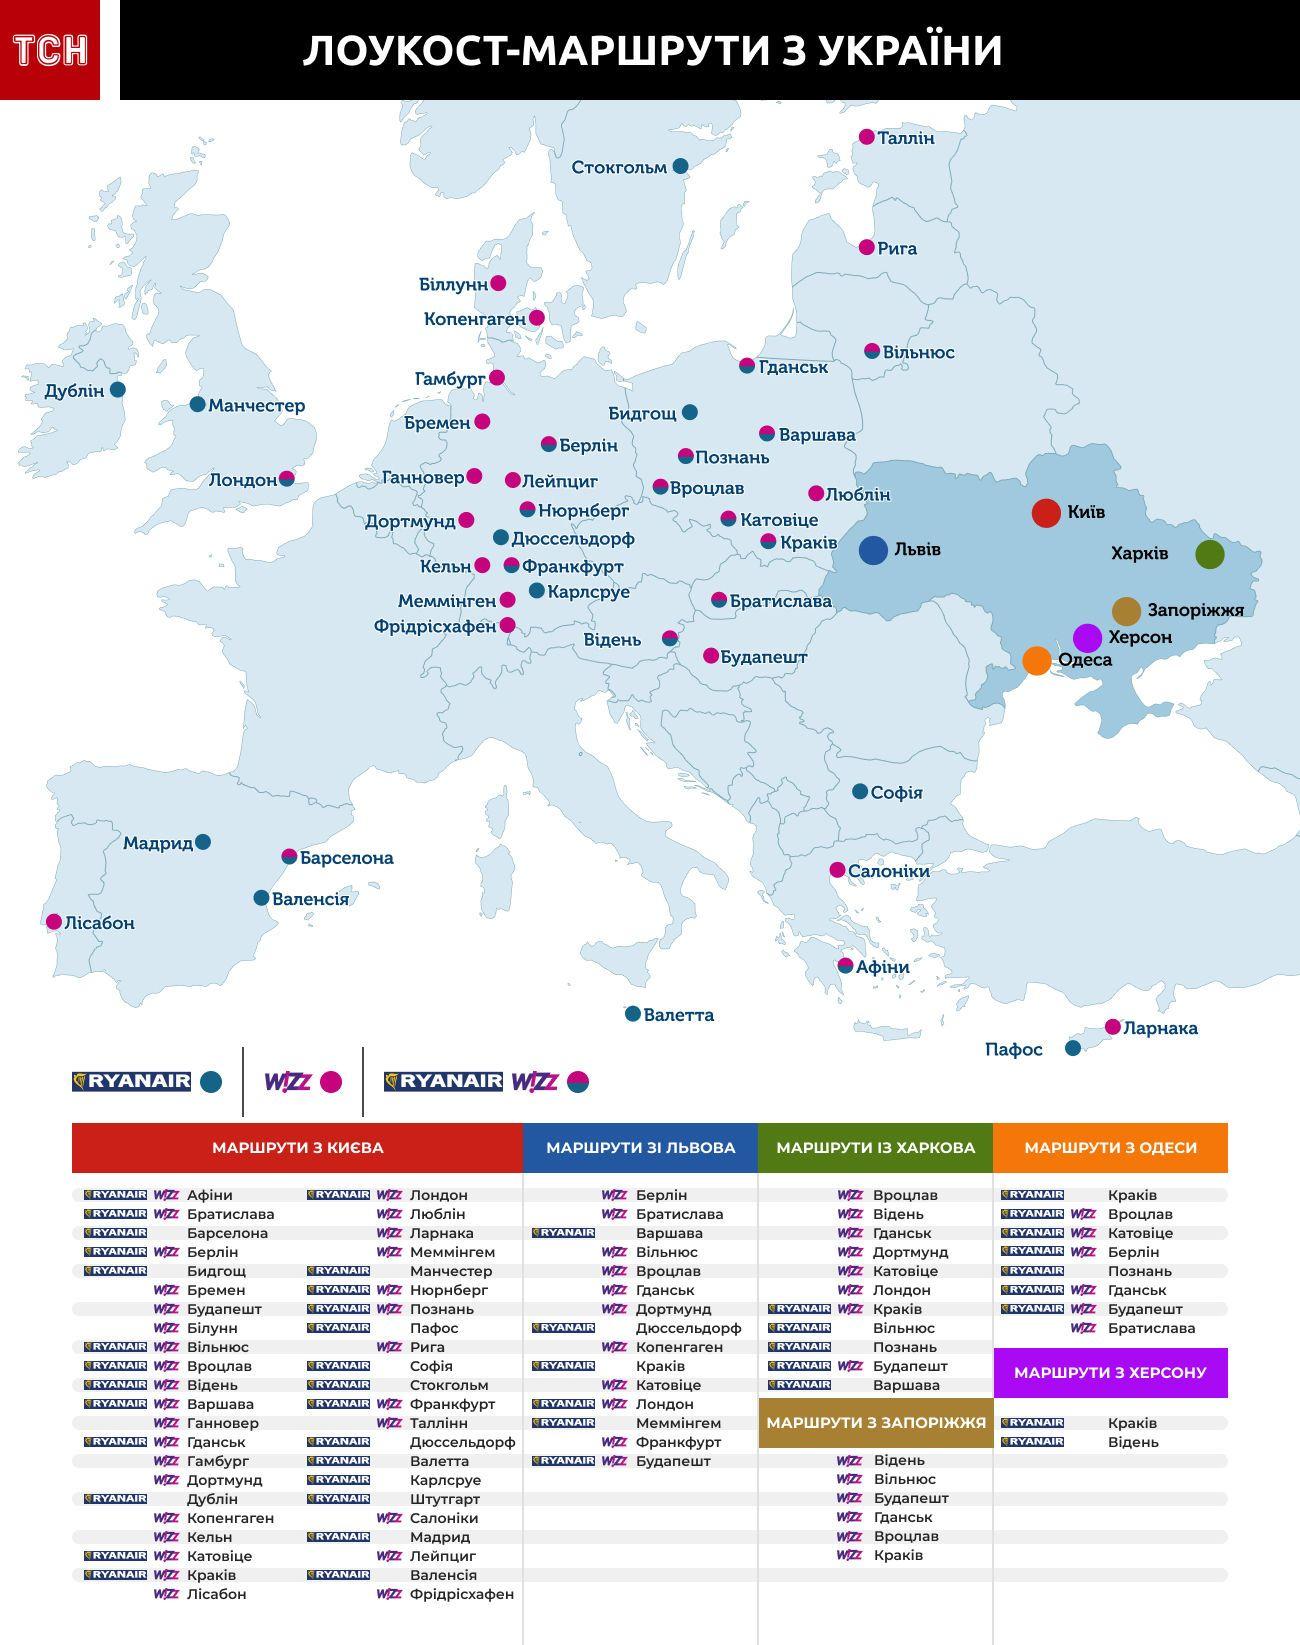 Лоукост-маршрути з України (23-10-19)